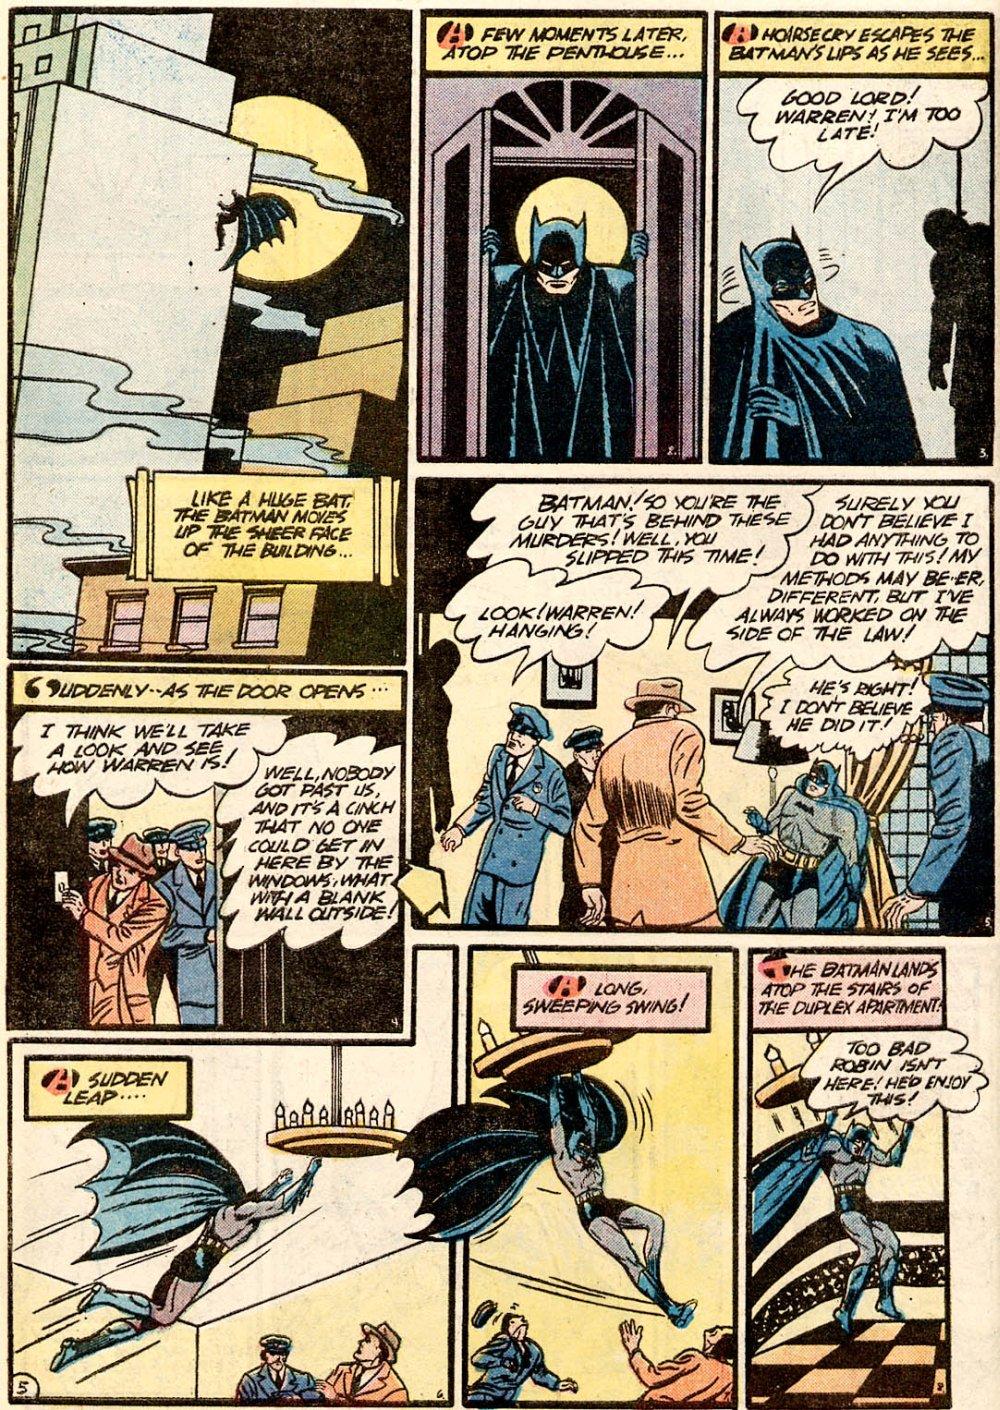 Detective Comics (1937) 441 Page 31